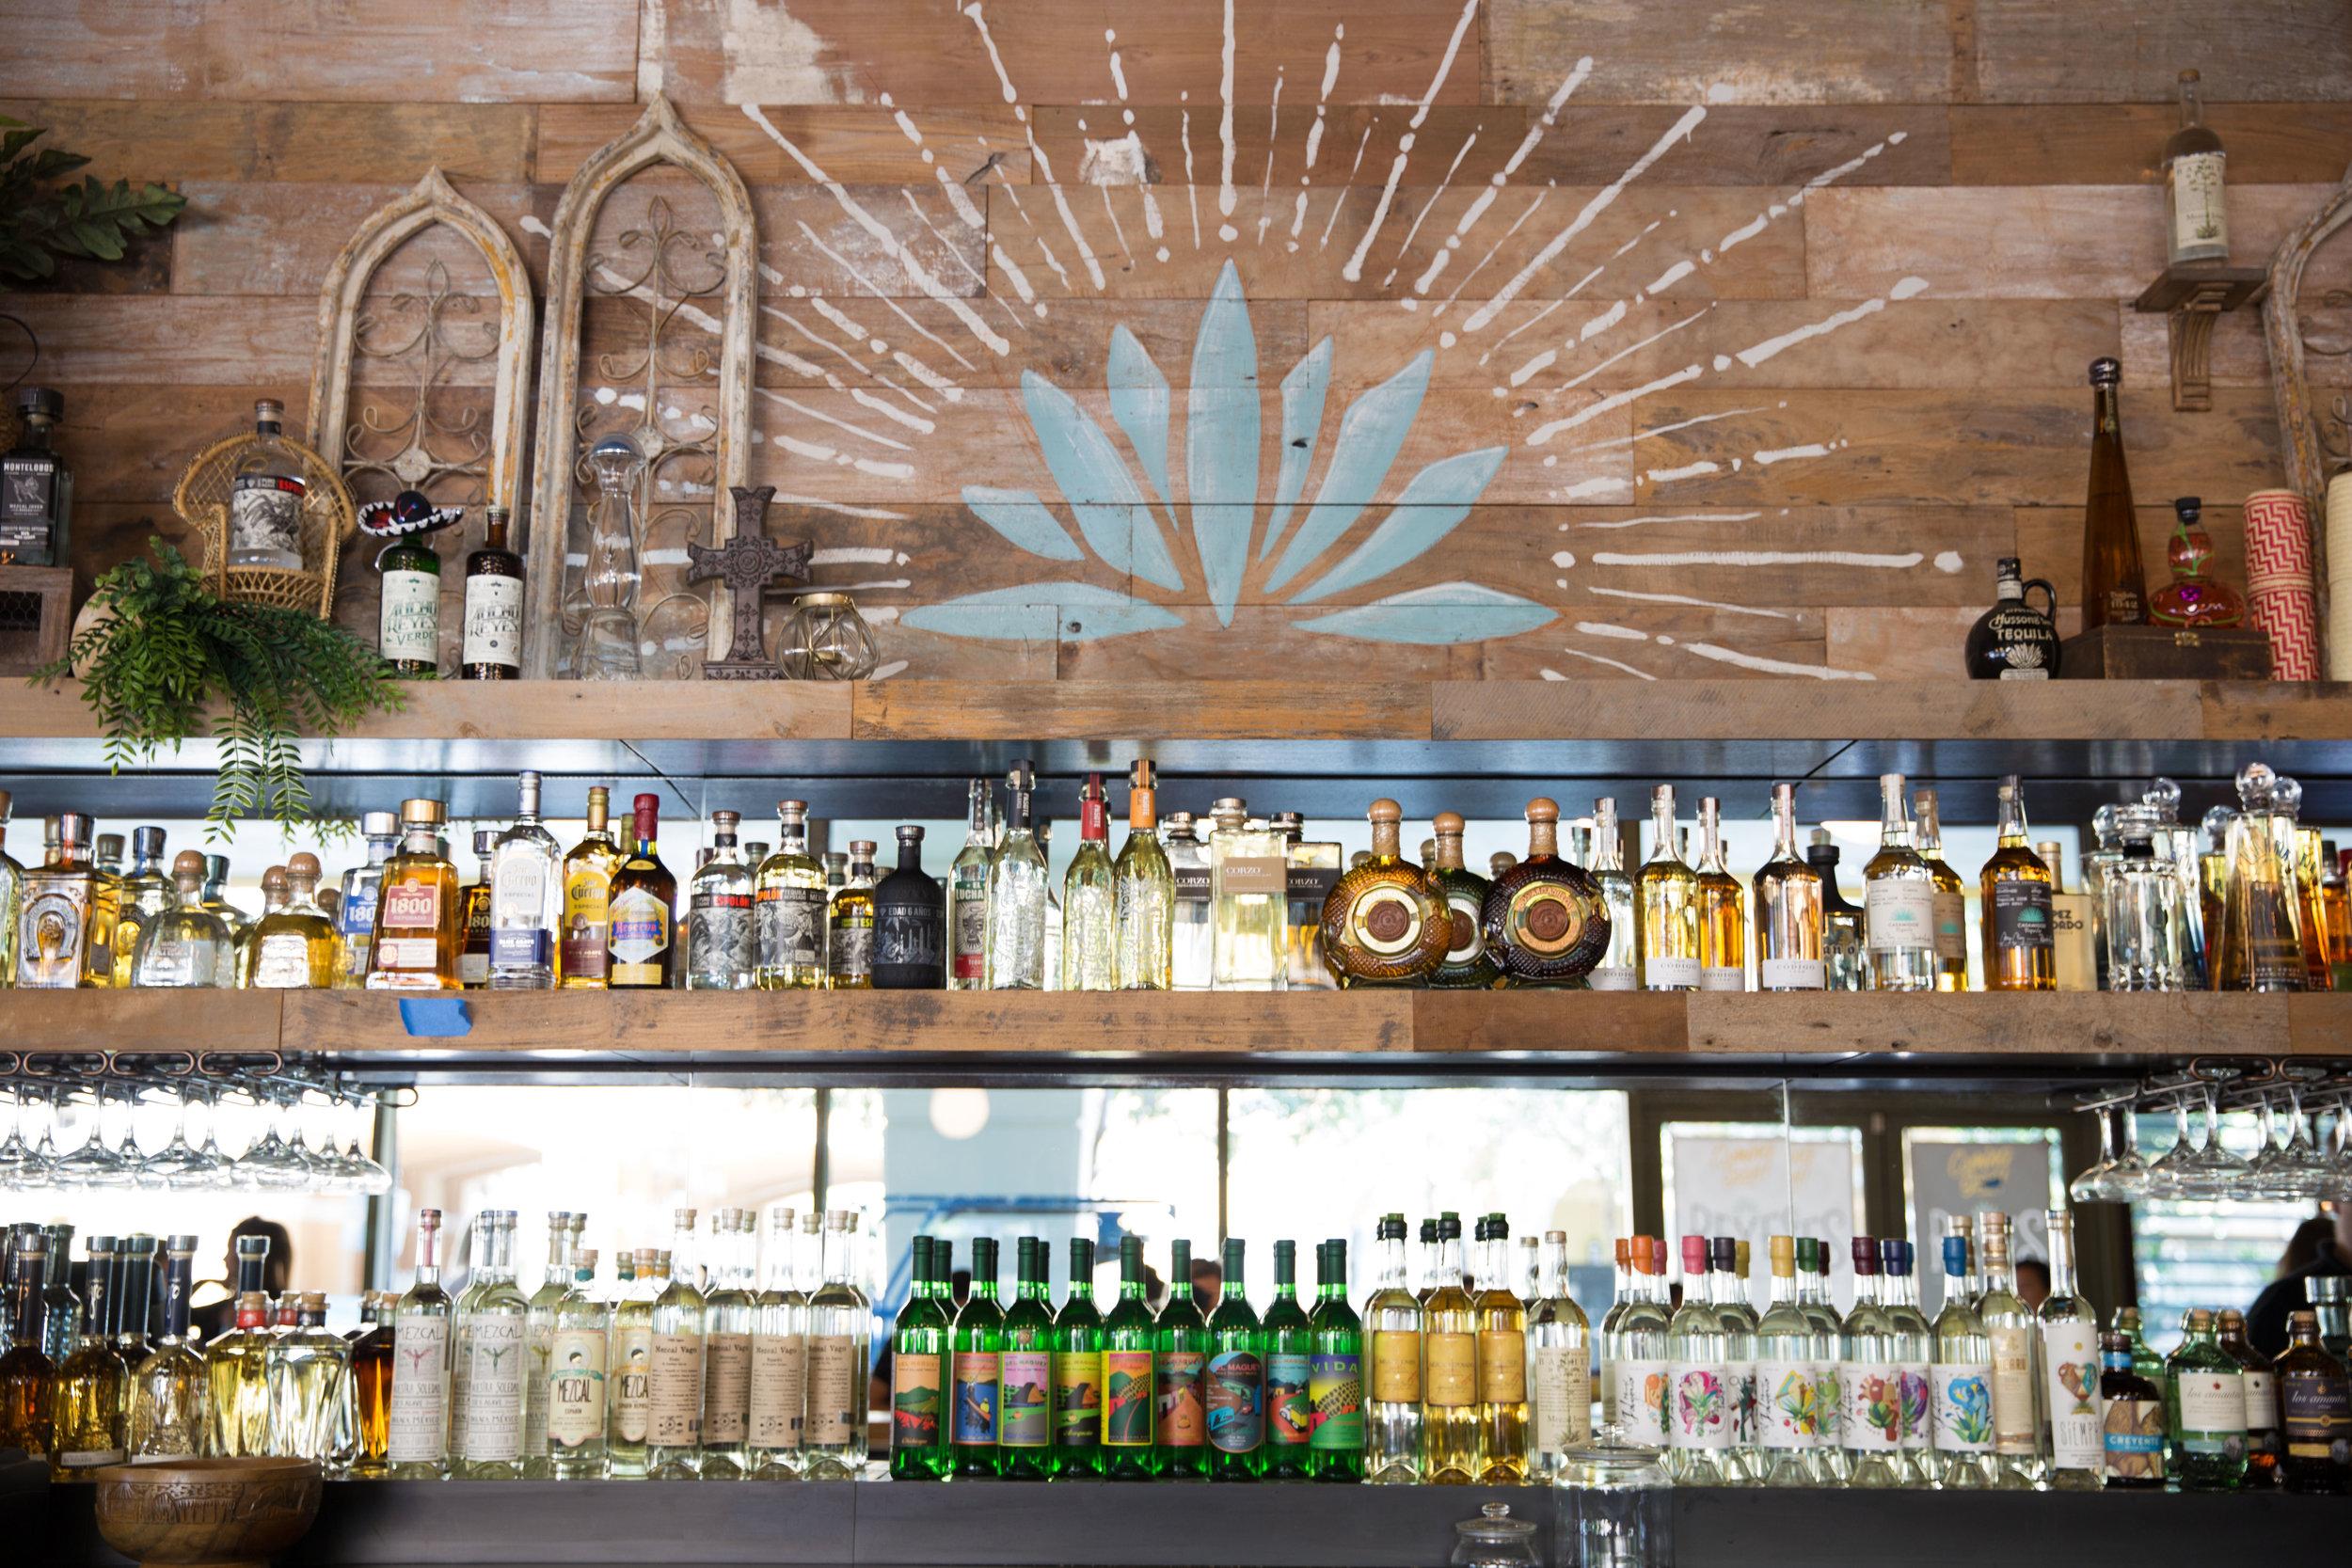 Reyes Mezcaleria Bar